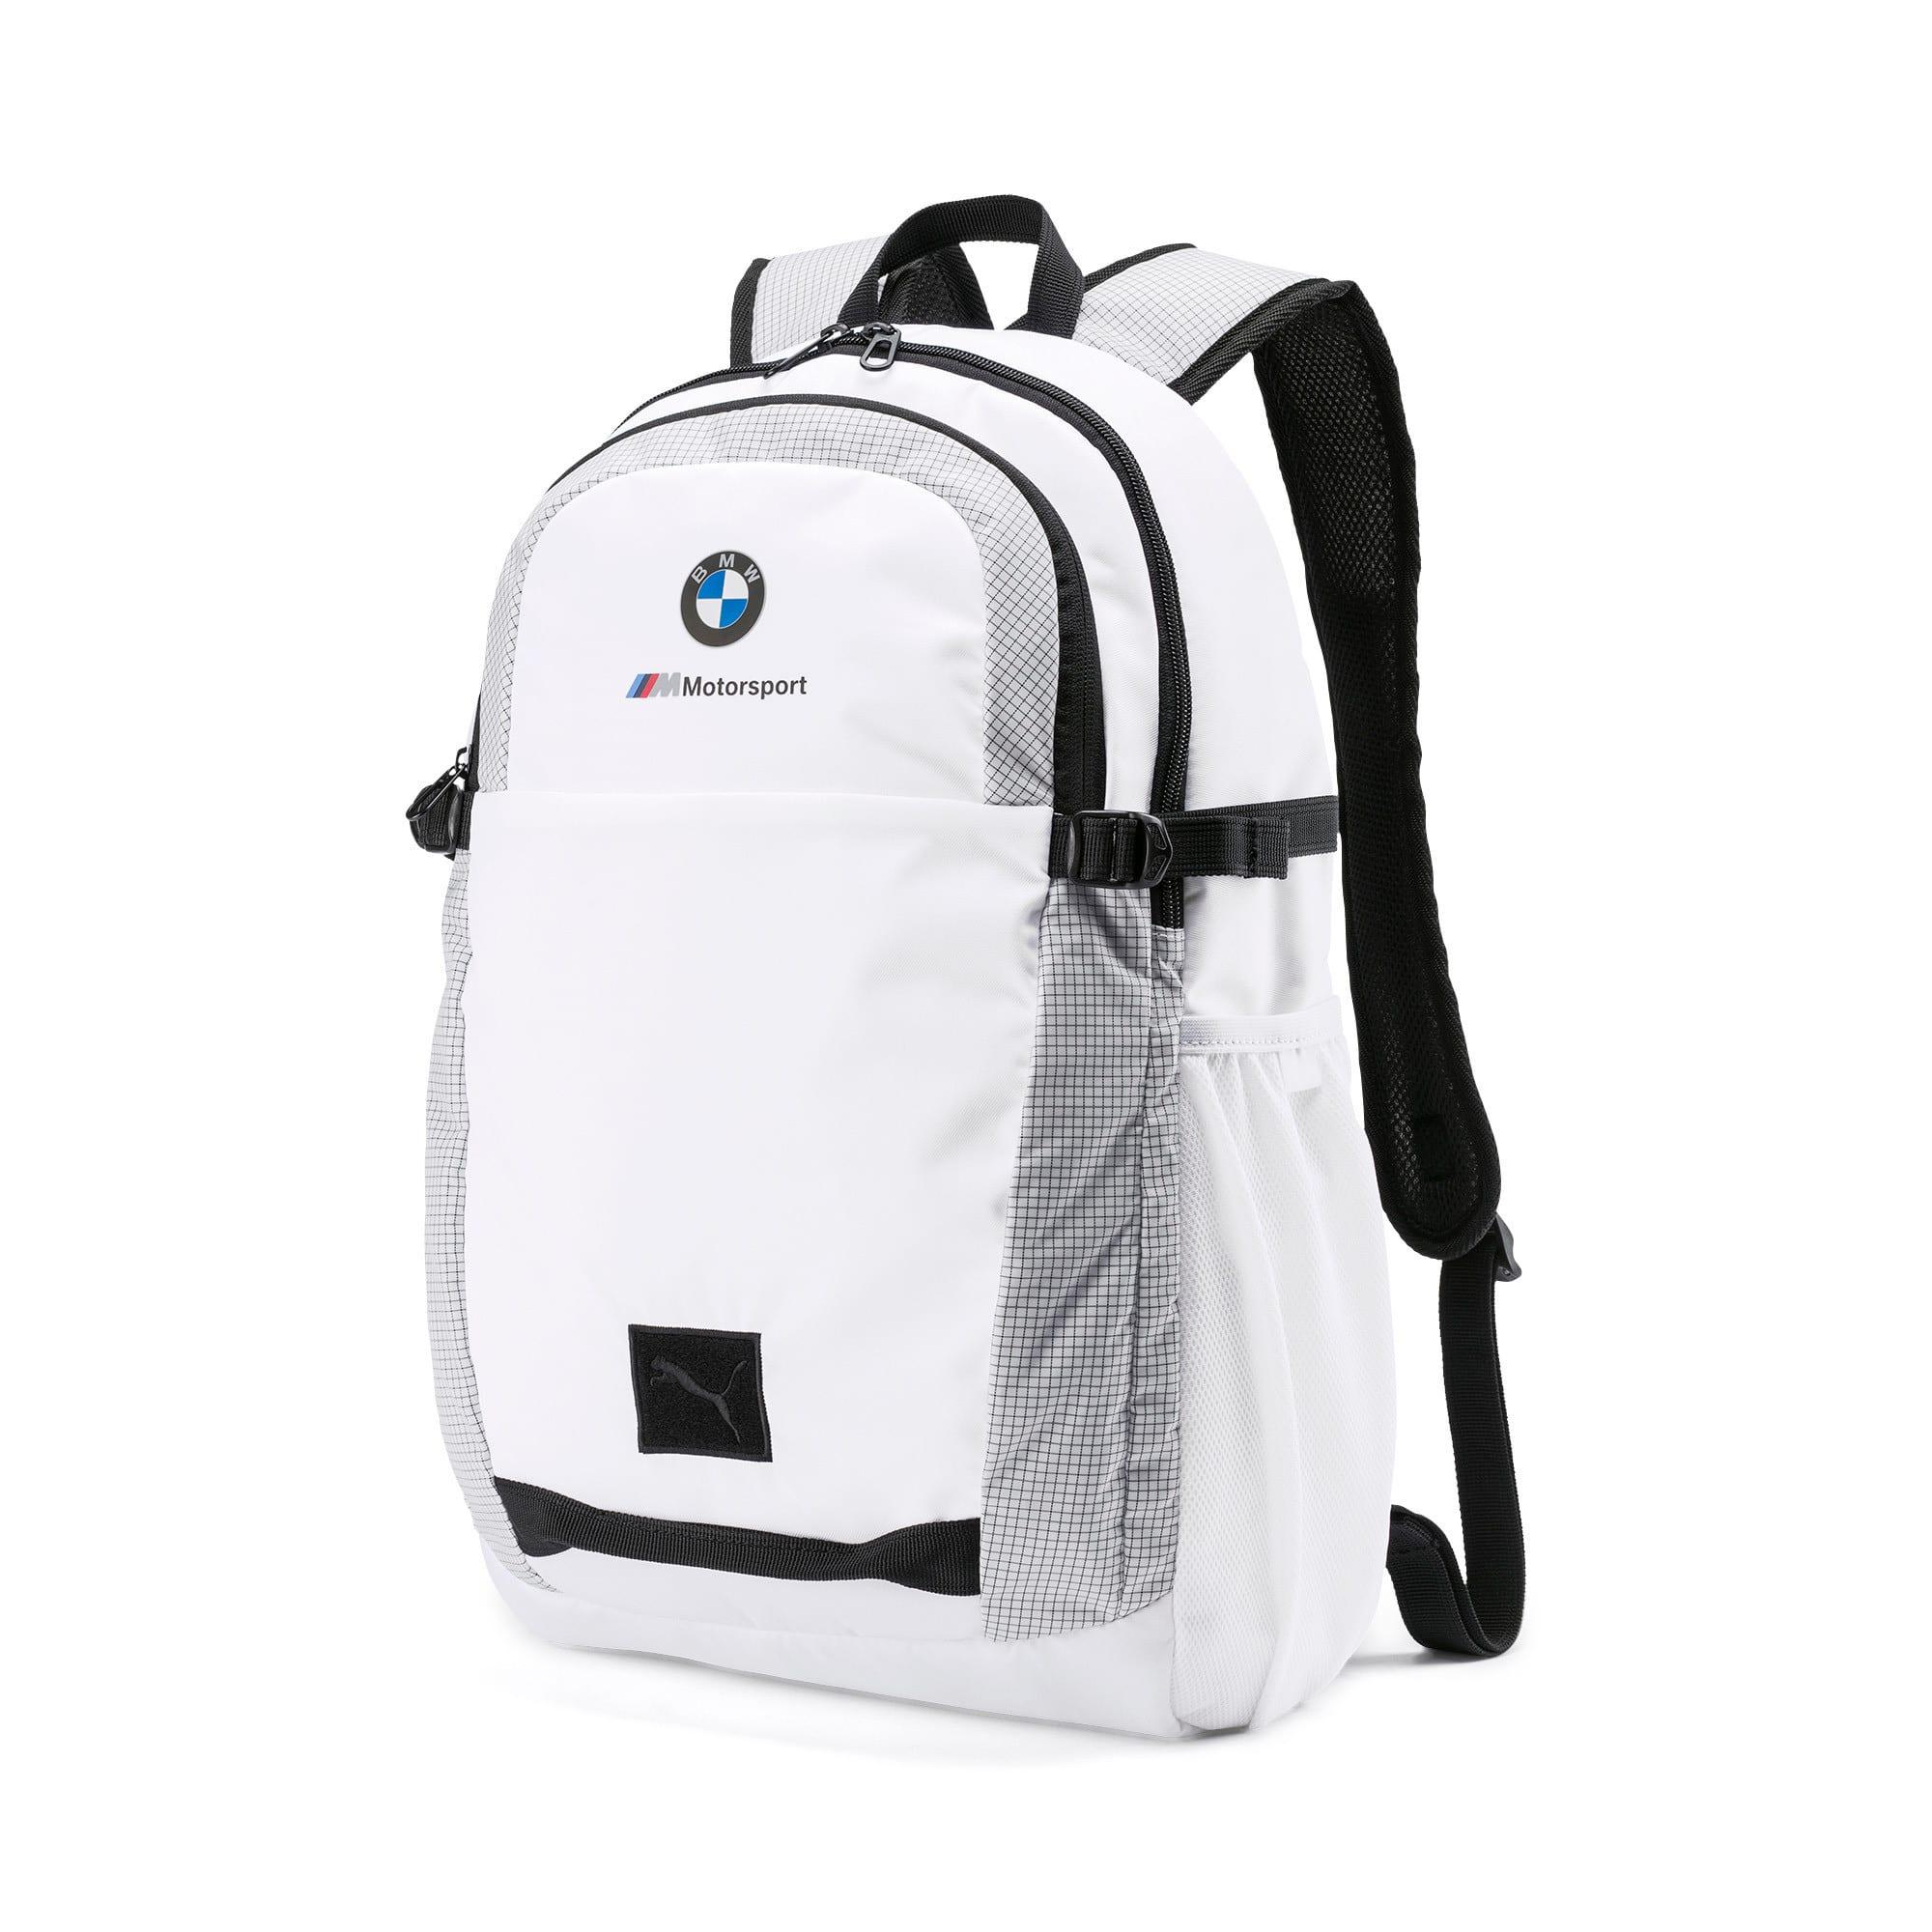 Thumbnail 1 of BMW W motorsport rugzak, Puma White, medium